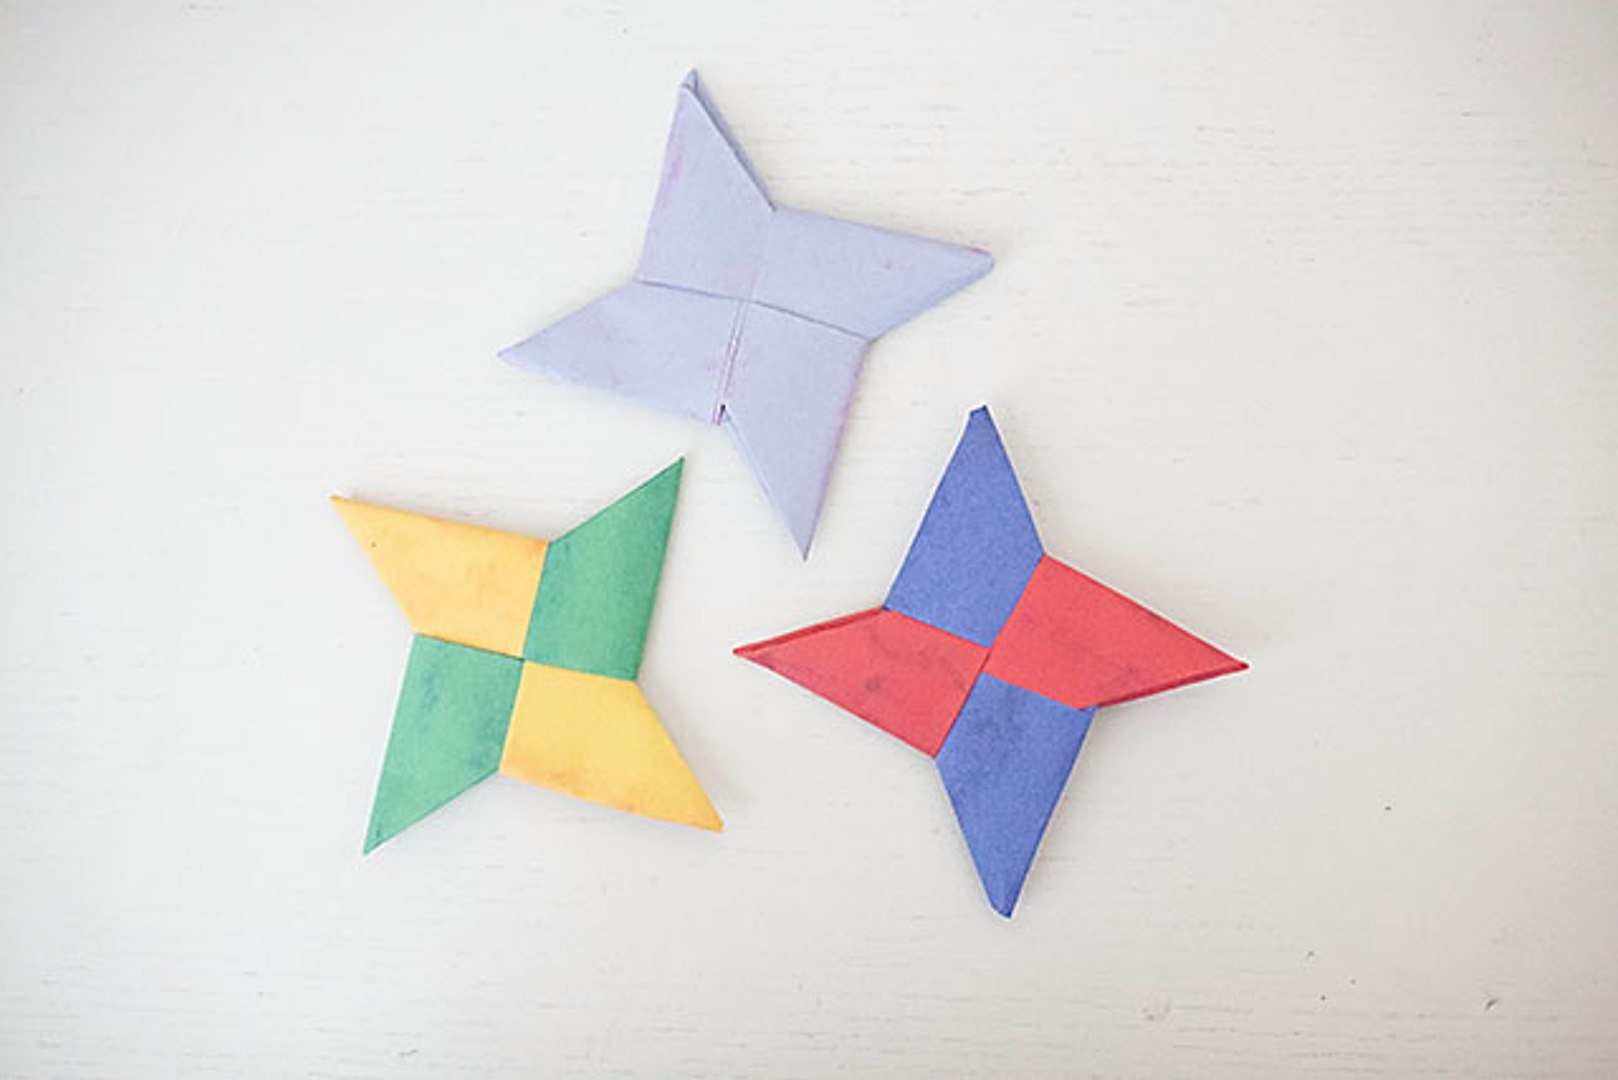 How to Make an Origami Ninja Star (Shuriken) - Double-Sided ... | 1080x1618